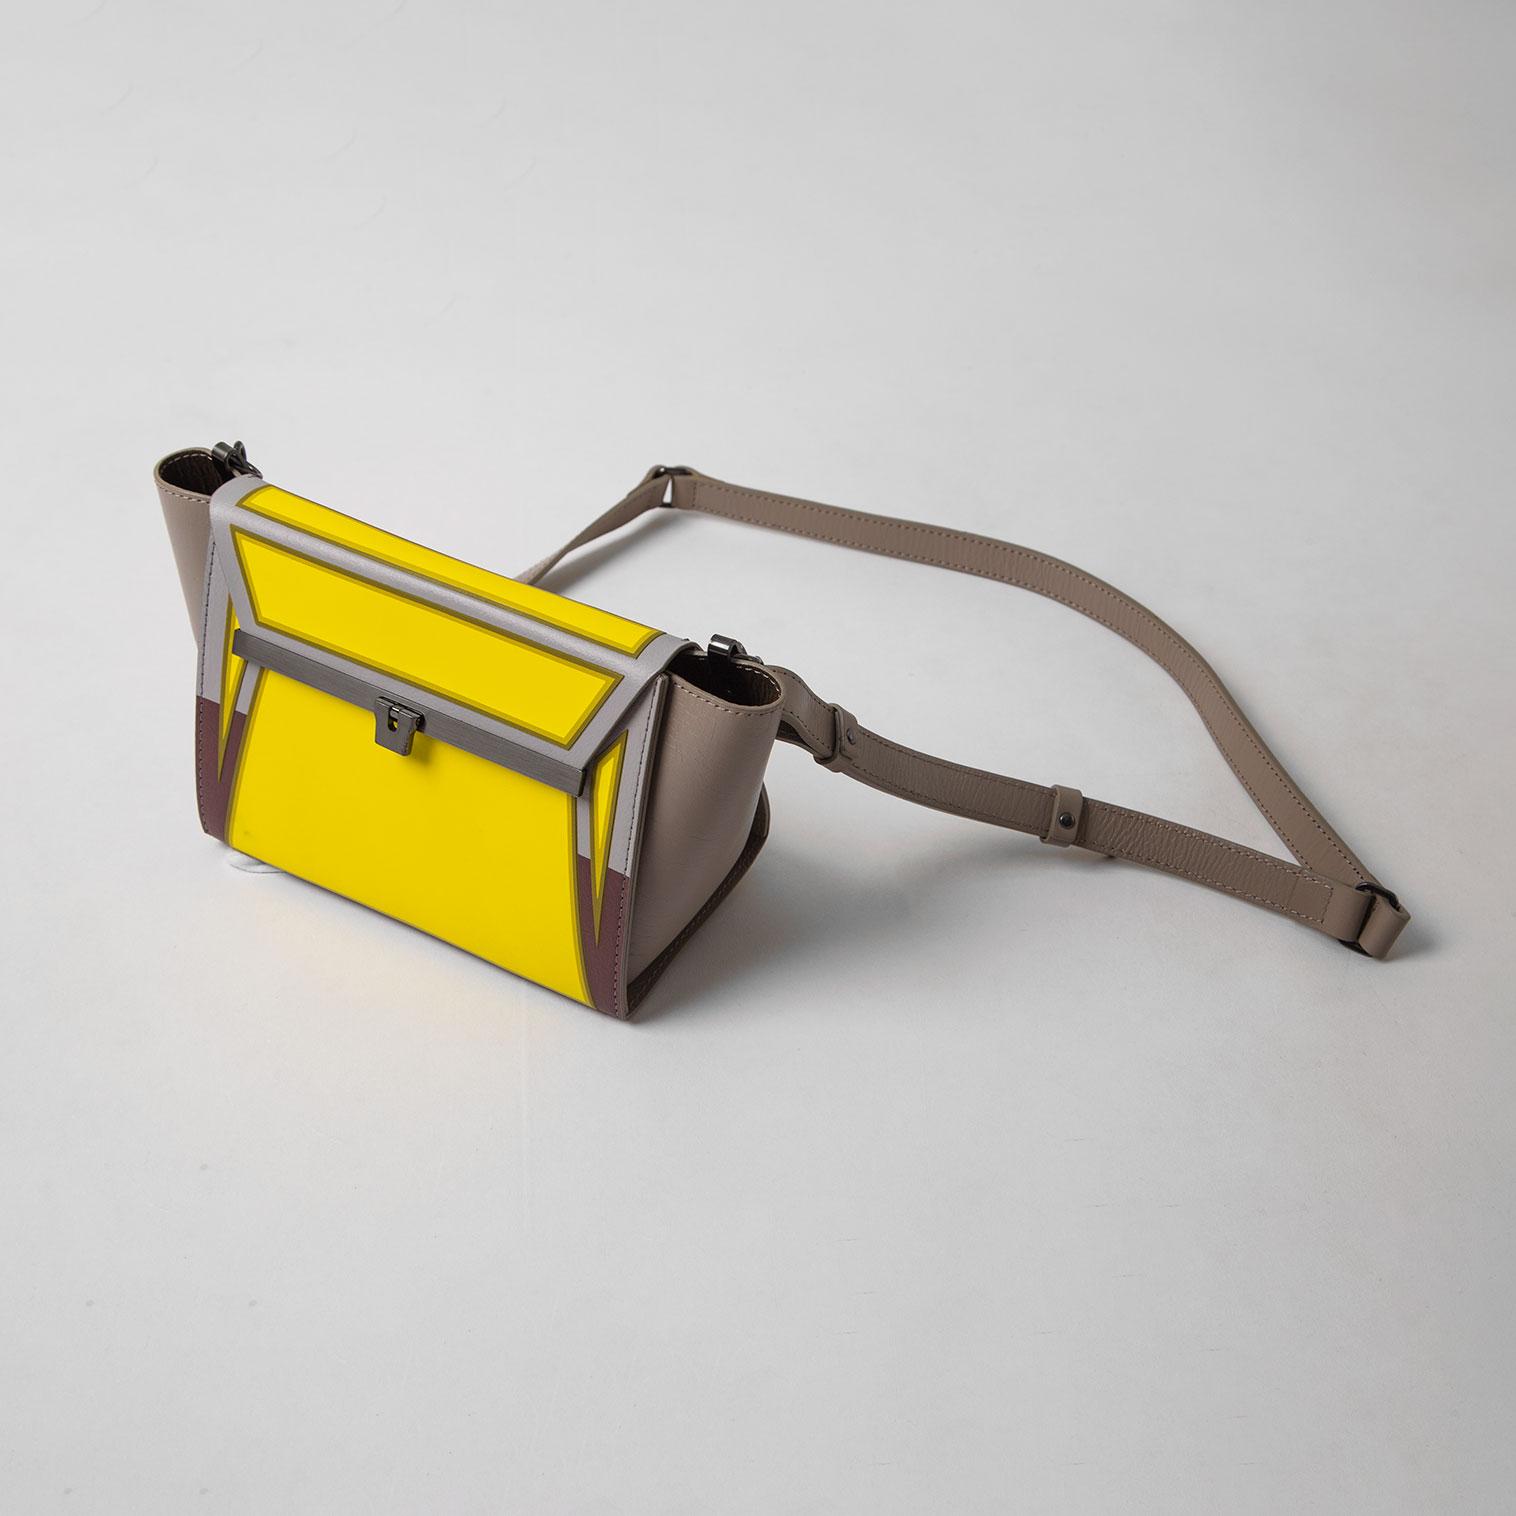 ISSEY MIYAKE GUSTON Shoulder Bag